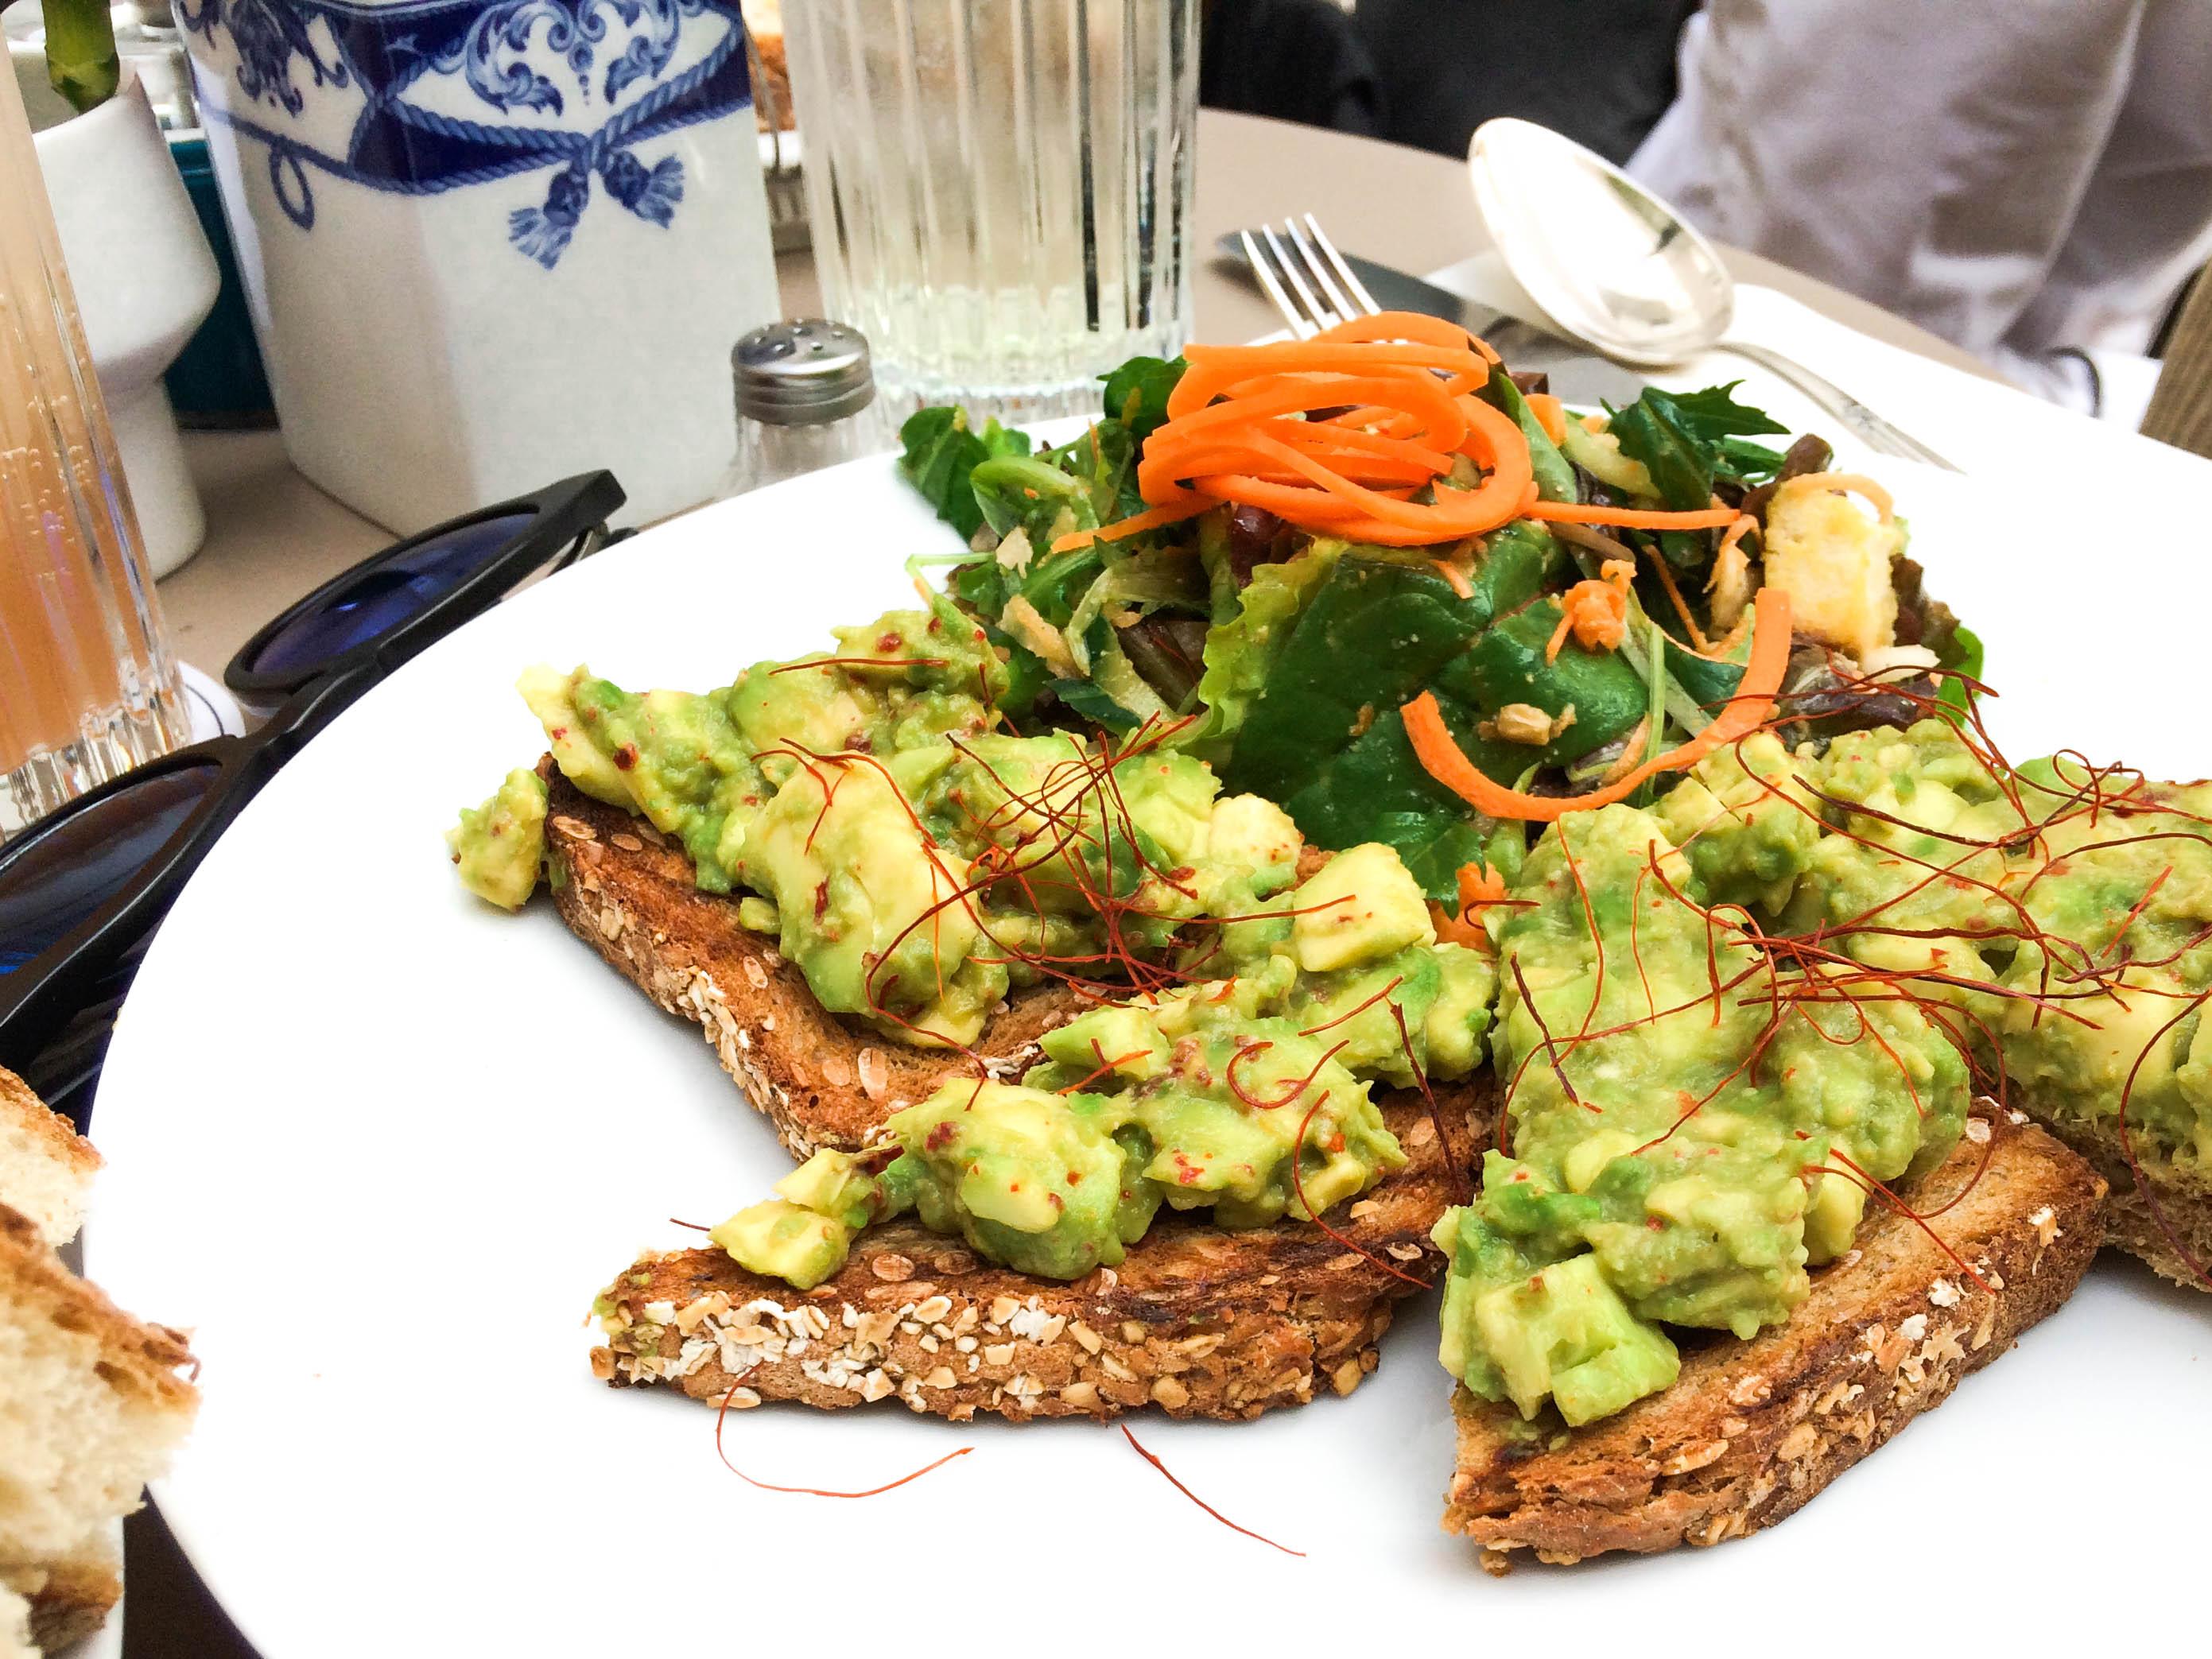 Stereo-Café-Munich-Hotspot-Lindarella-Vegan-Clean-Healthy-Foodblogger-München-Deutschland-Fitnessblog-2